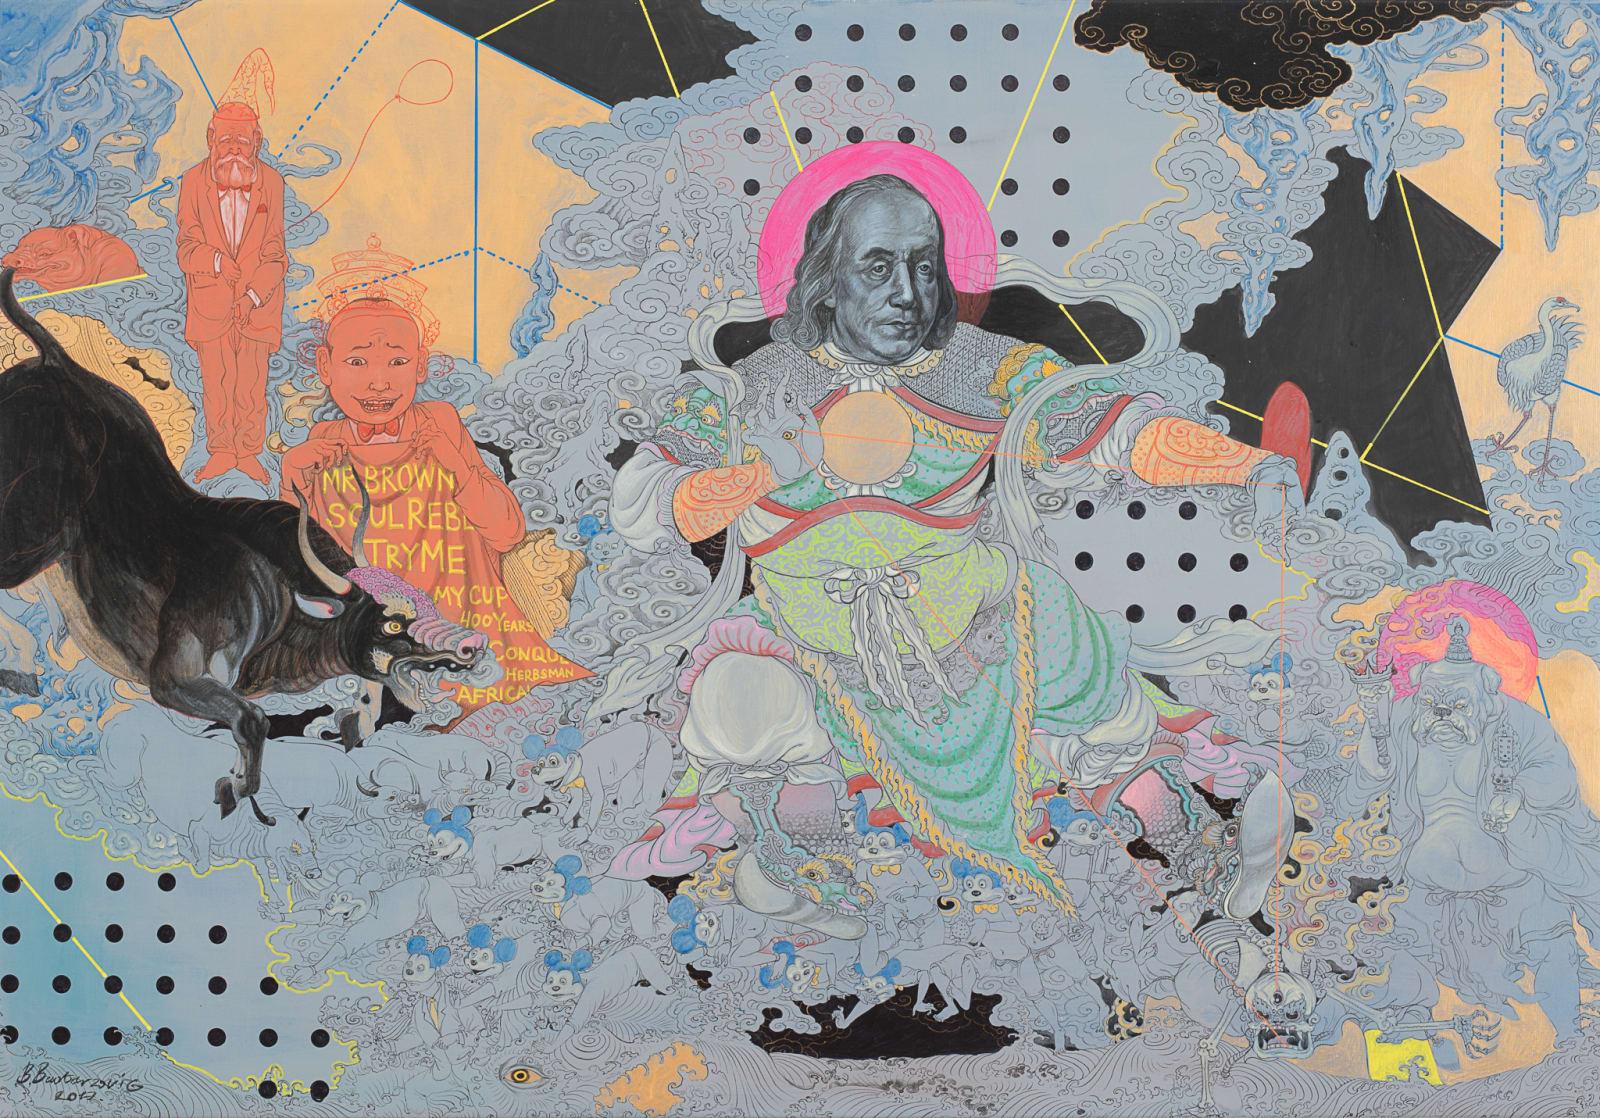 Baatarzorig Batjargal  New Lord, 2017  Acrylic on canvas  27 1/2 x 39 3/8 in  70 x 100 cm